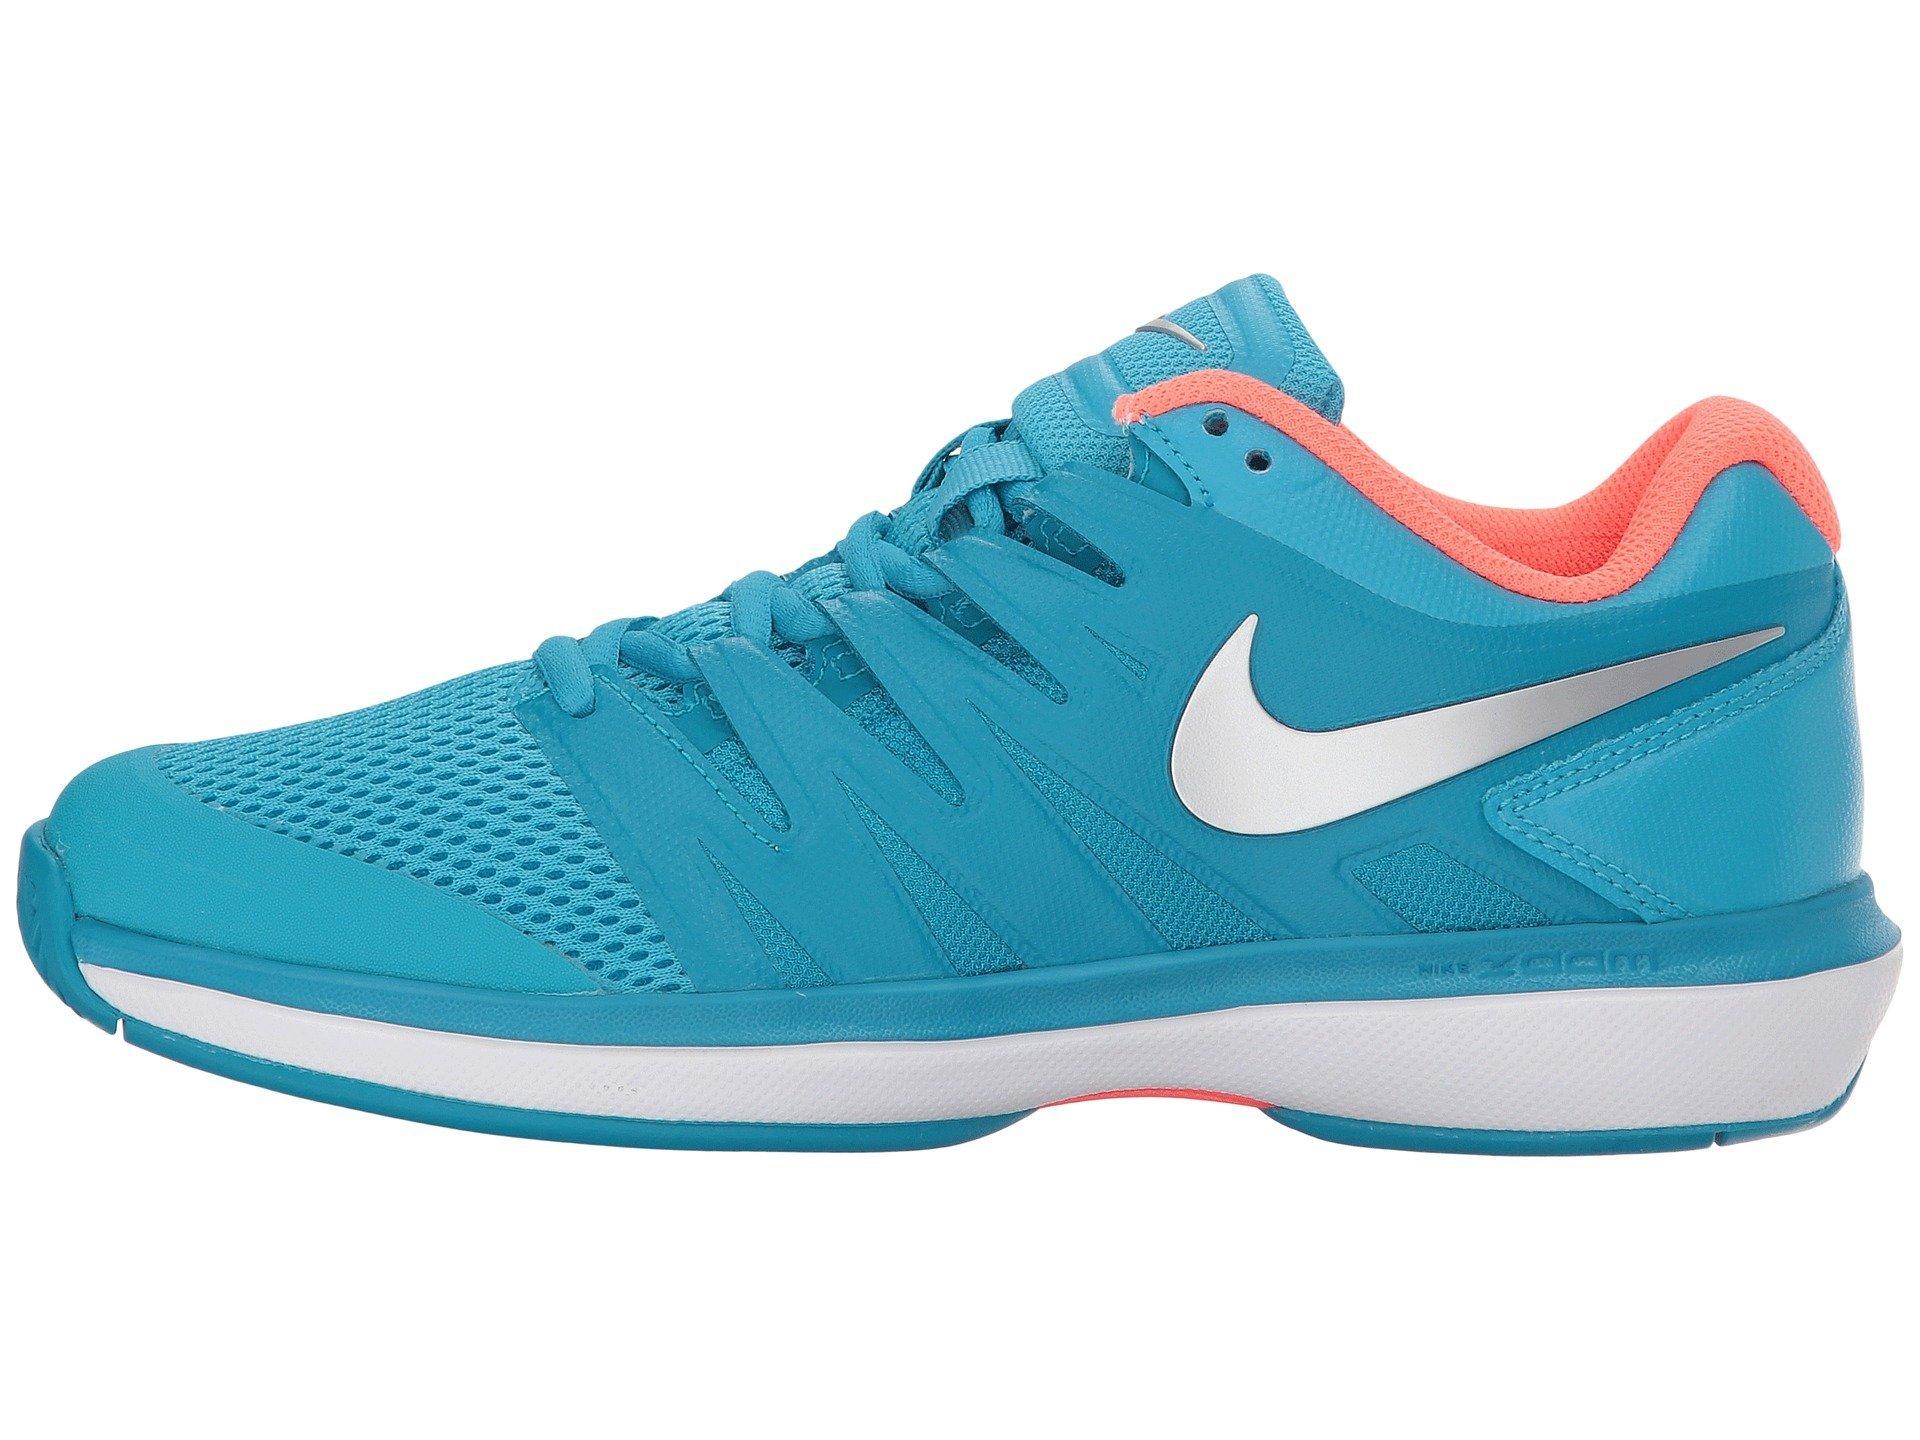 04494e399bea Galleon - Nike Women s Air Zoom Prestige Tennis Shoes (8.5 B US